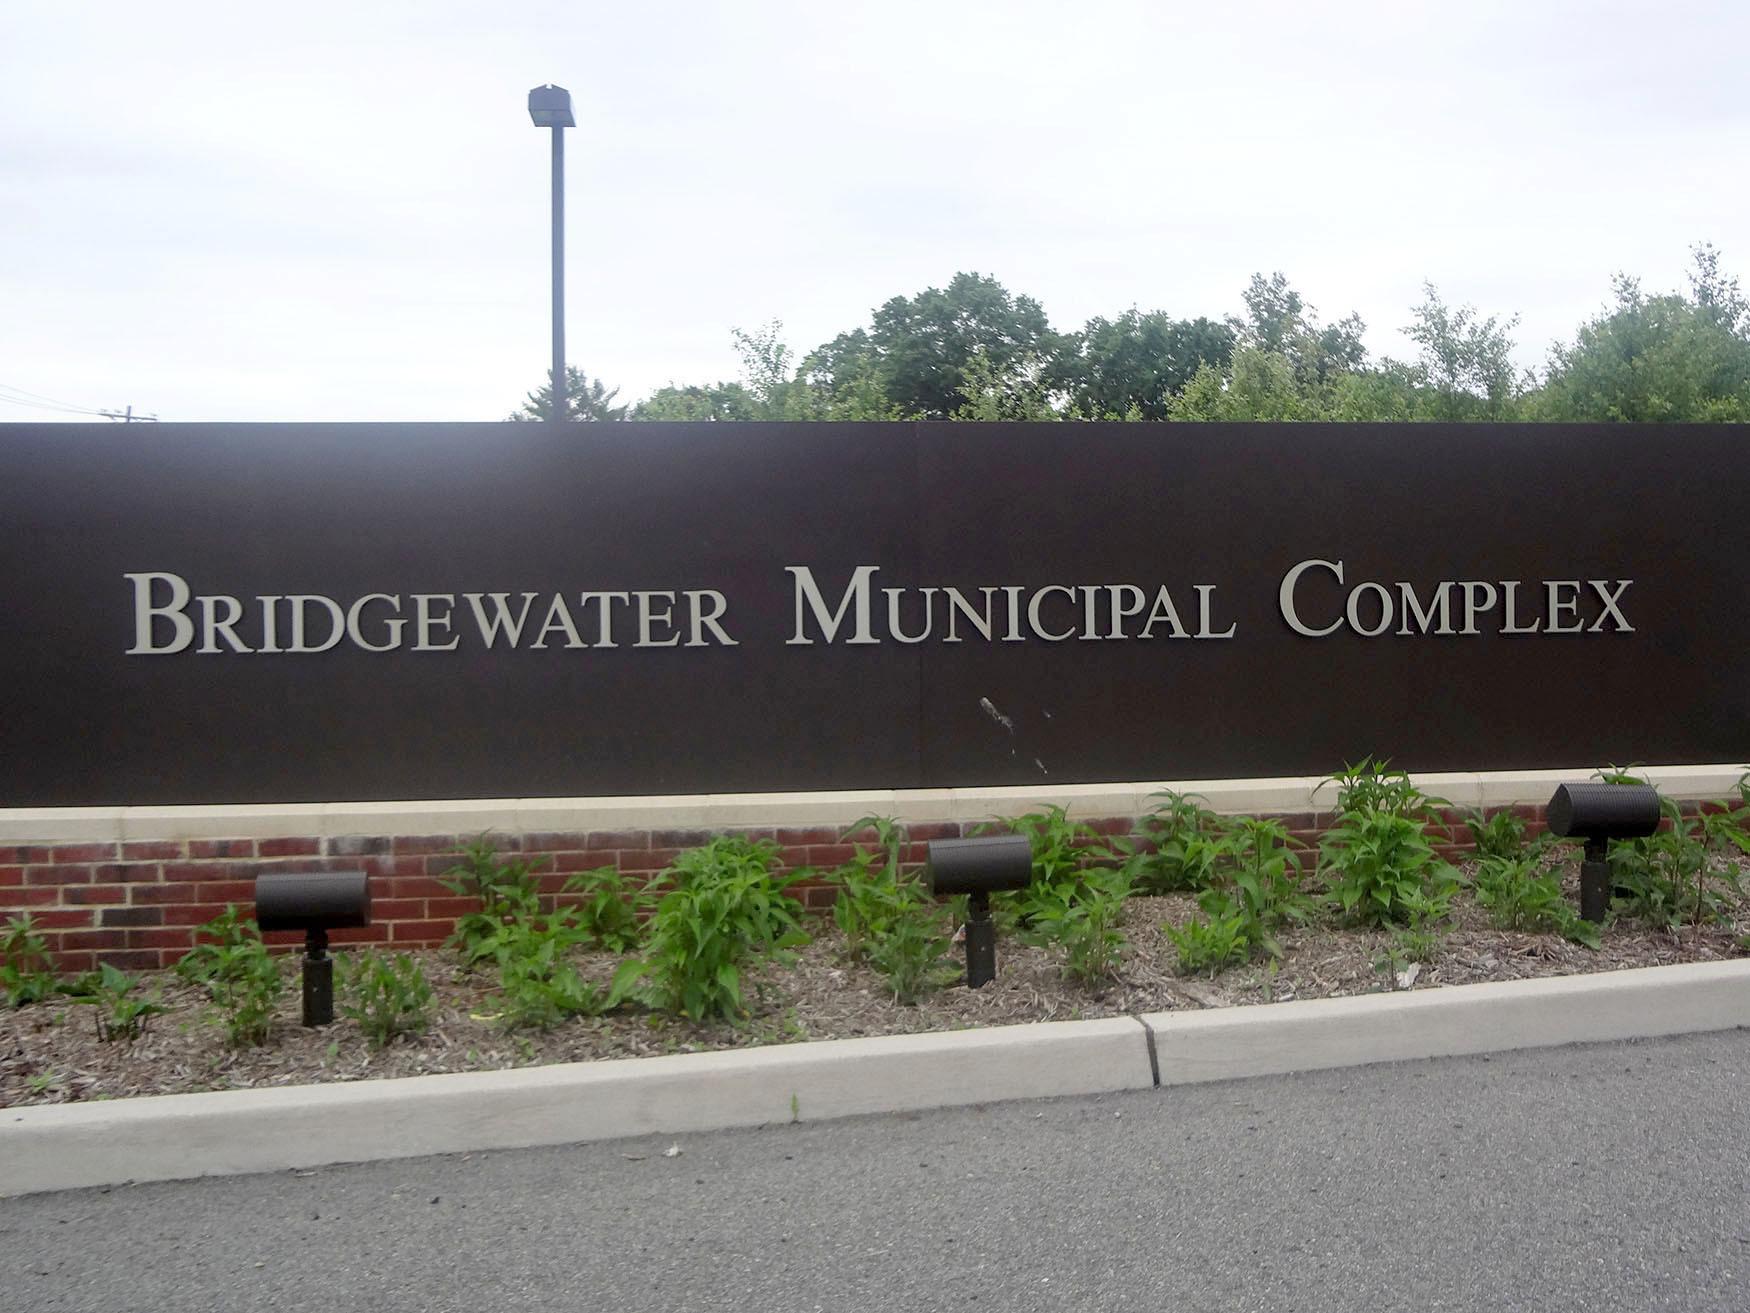 cbbdcccfc1b53e1ee9c1_Bridgewater_municipal.jpg